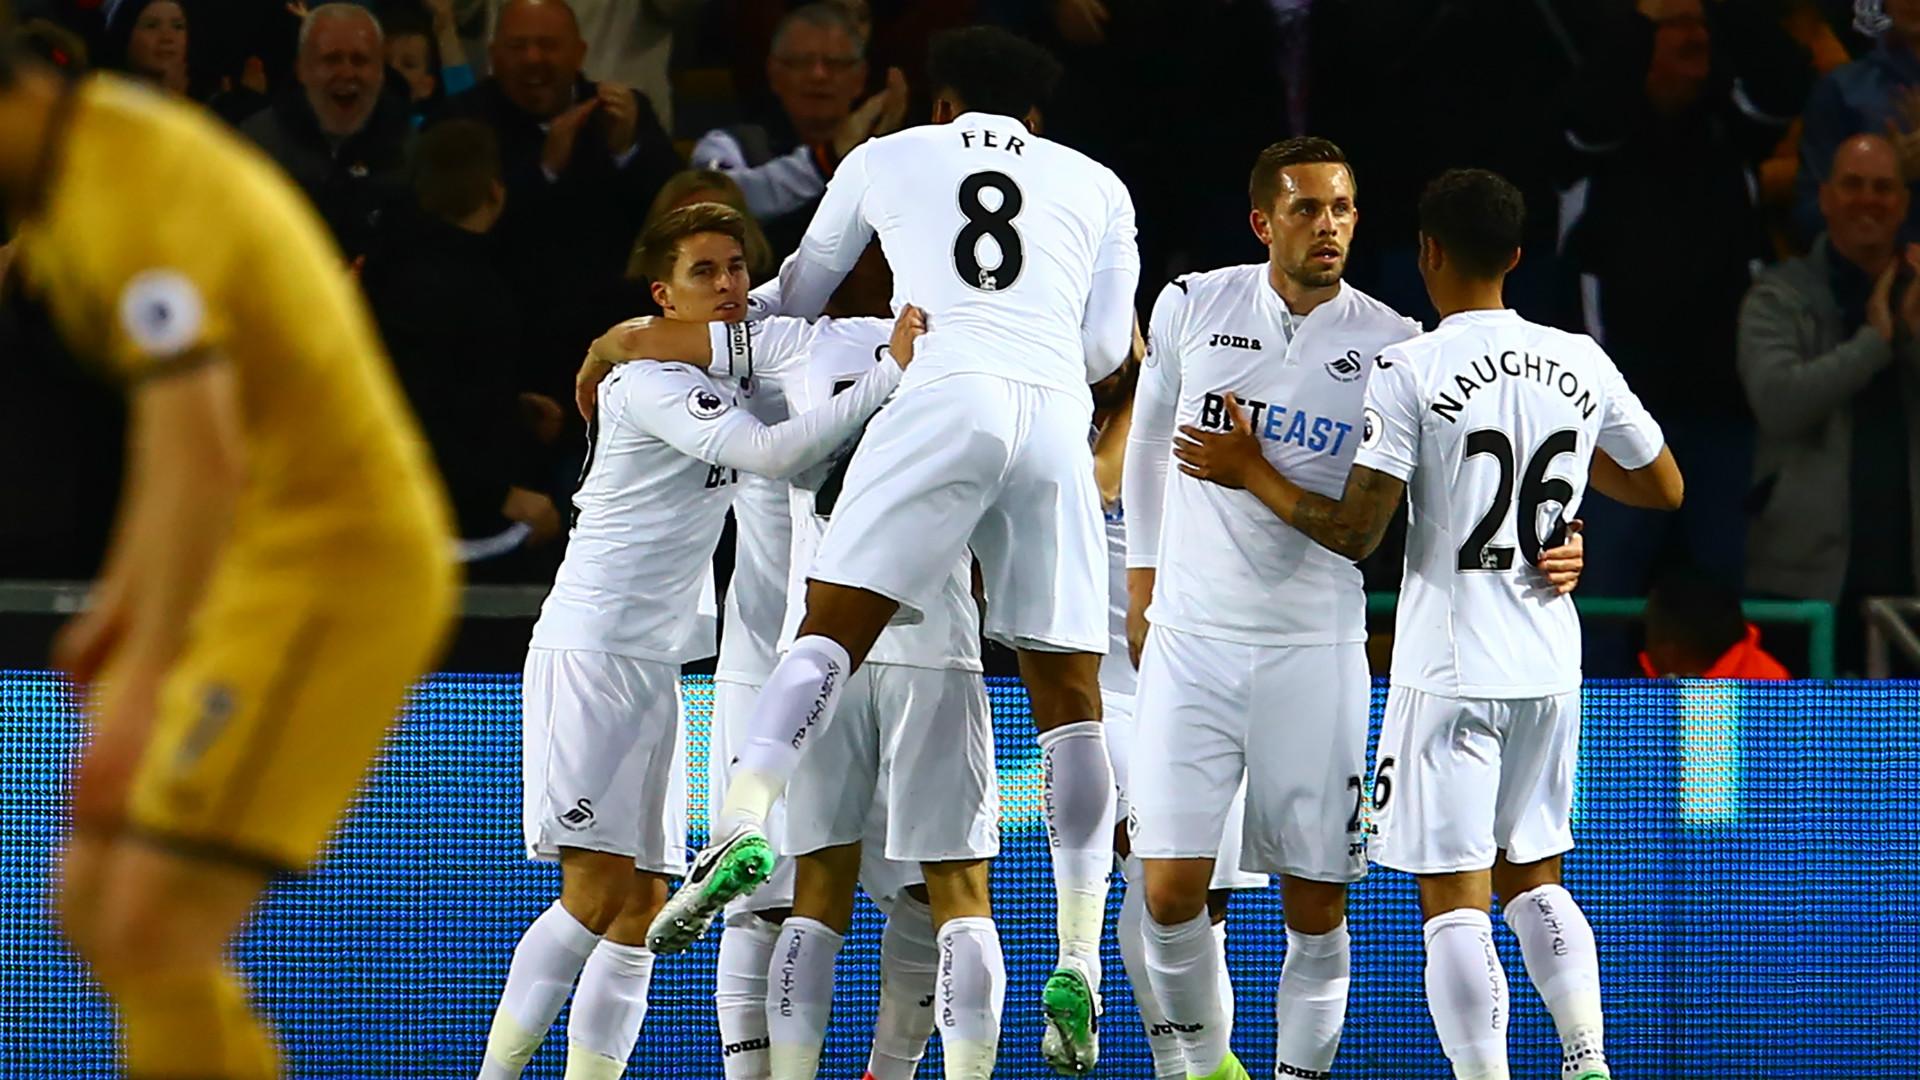 Swansea City celebrate